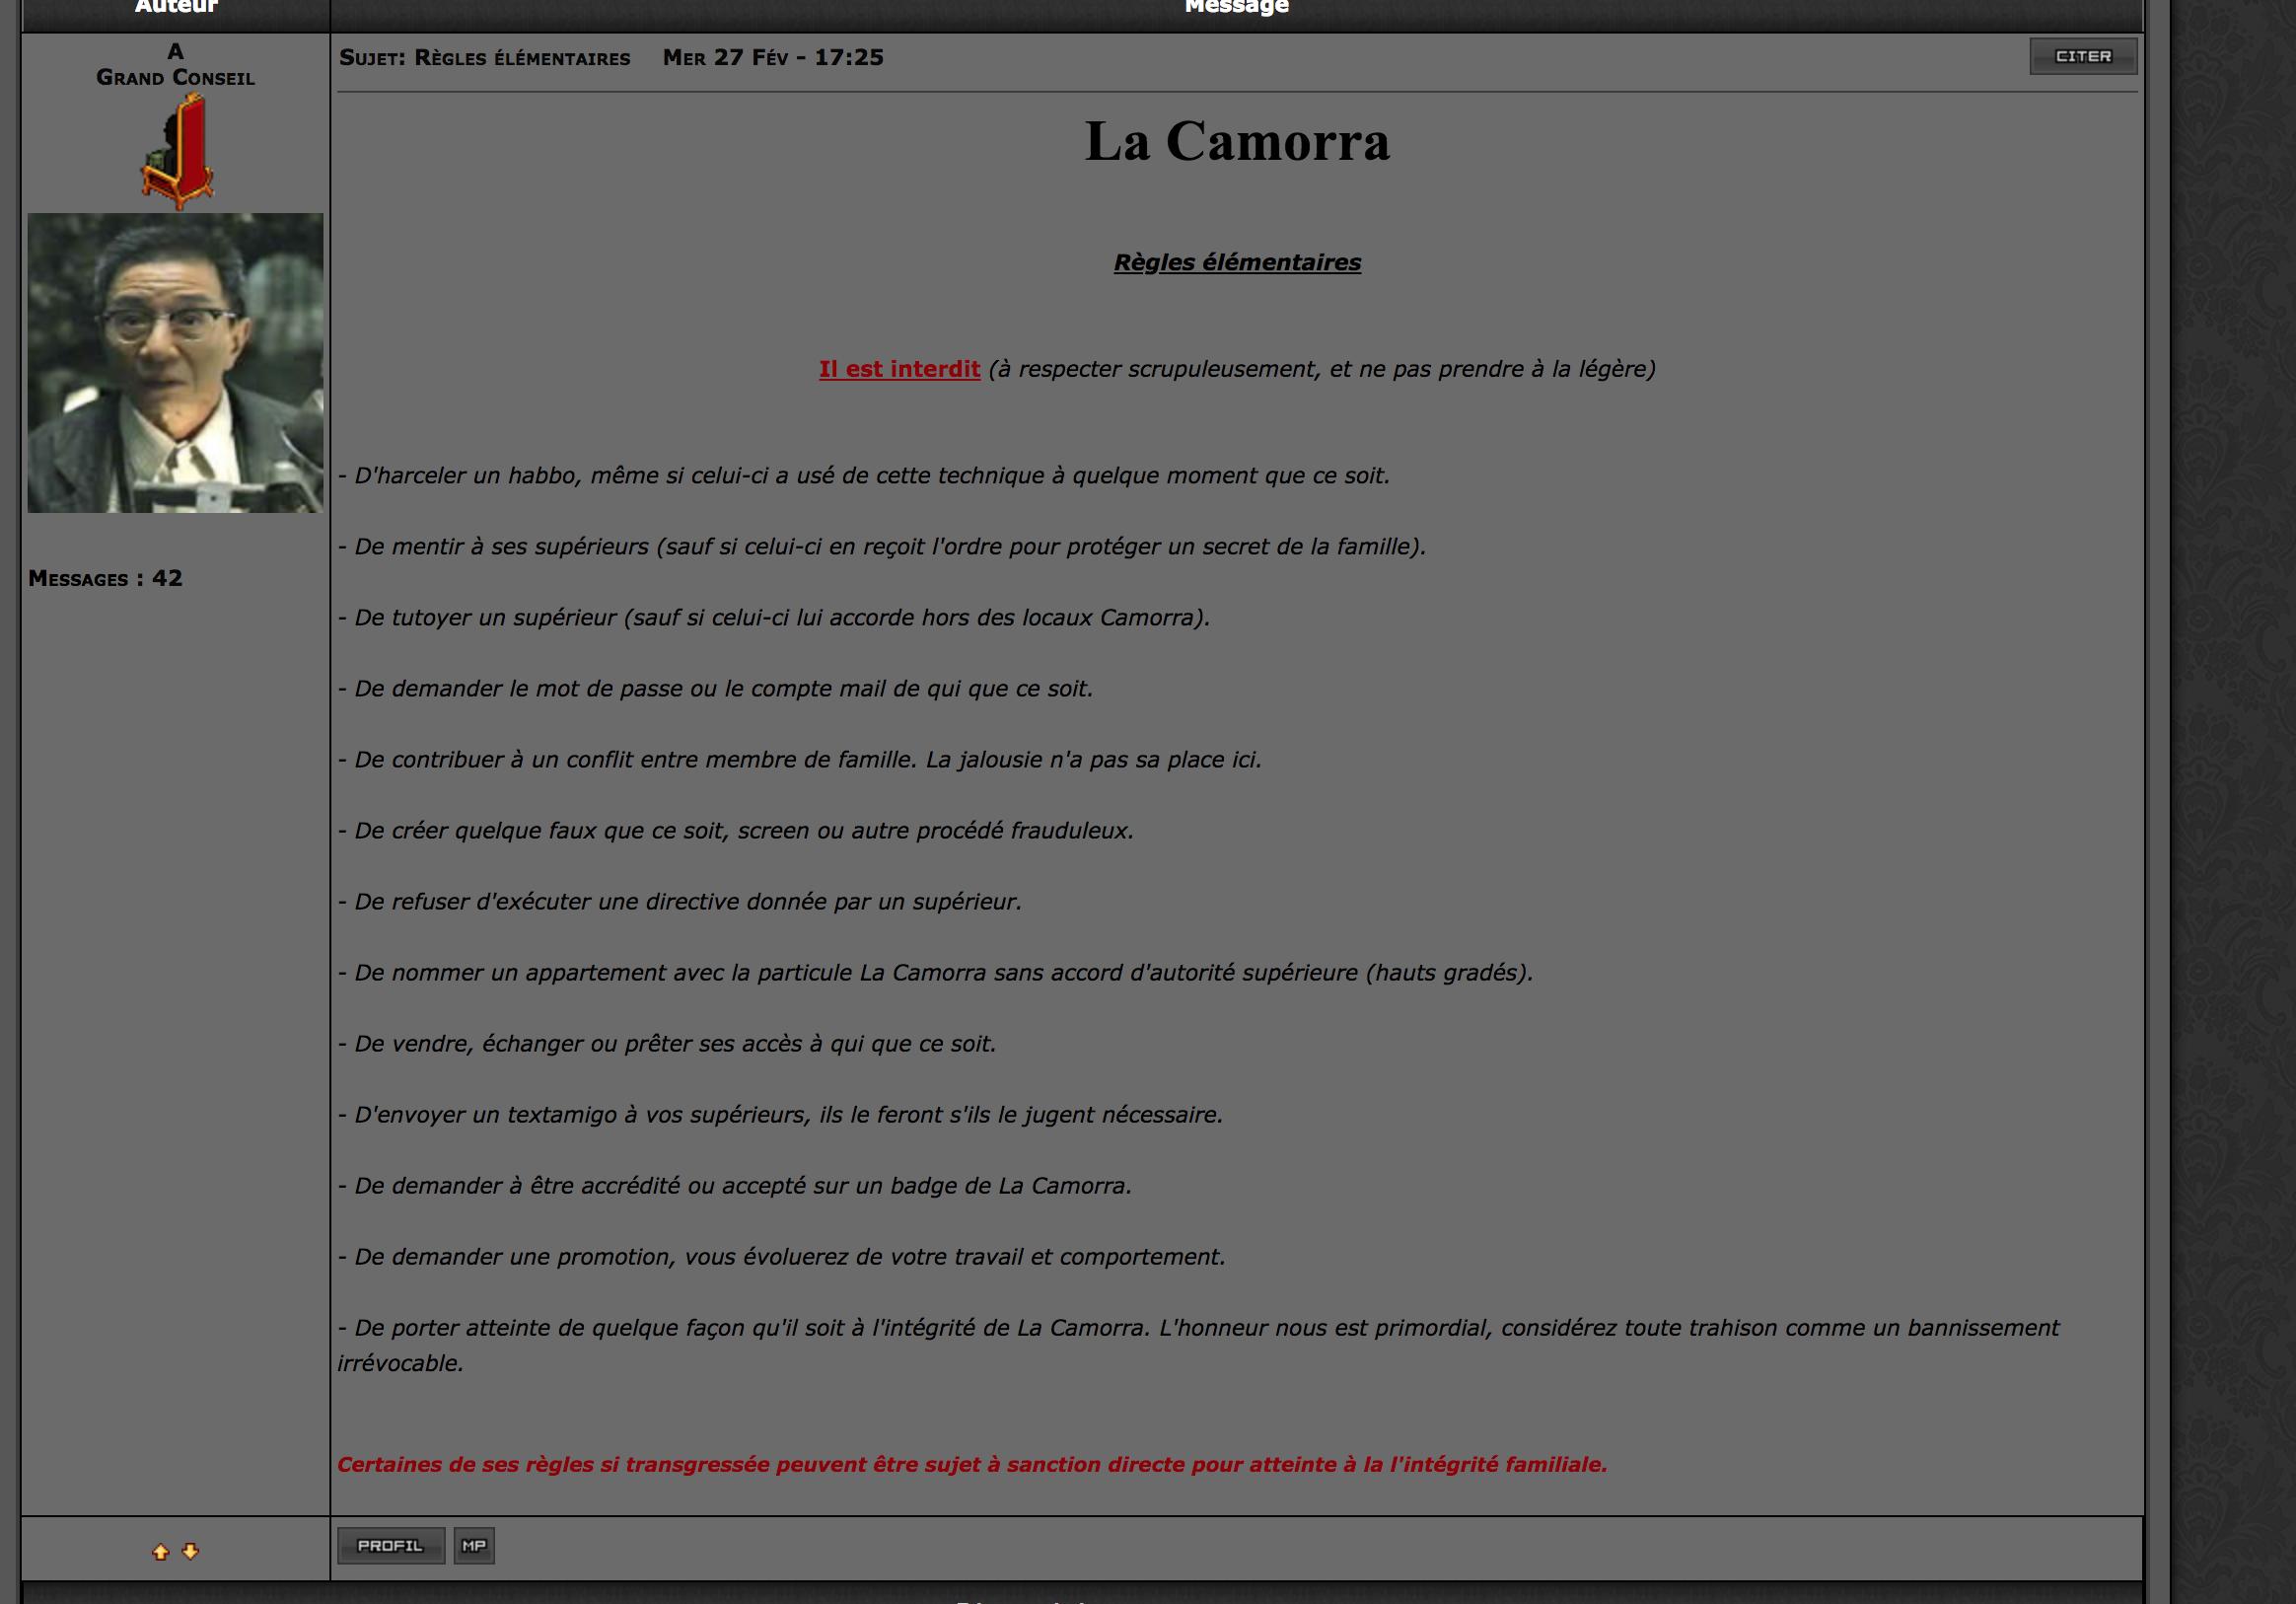 [Segrate 45001 Sfizio & Lucio] La Camorra : La Beuverie 1532881641-capture-d-ecran-2018-07-25-a-14-01-04